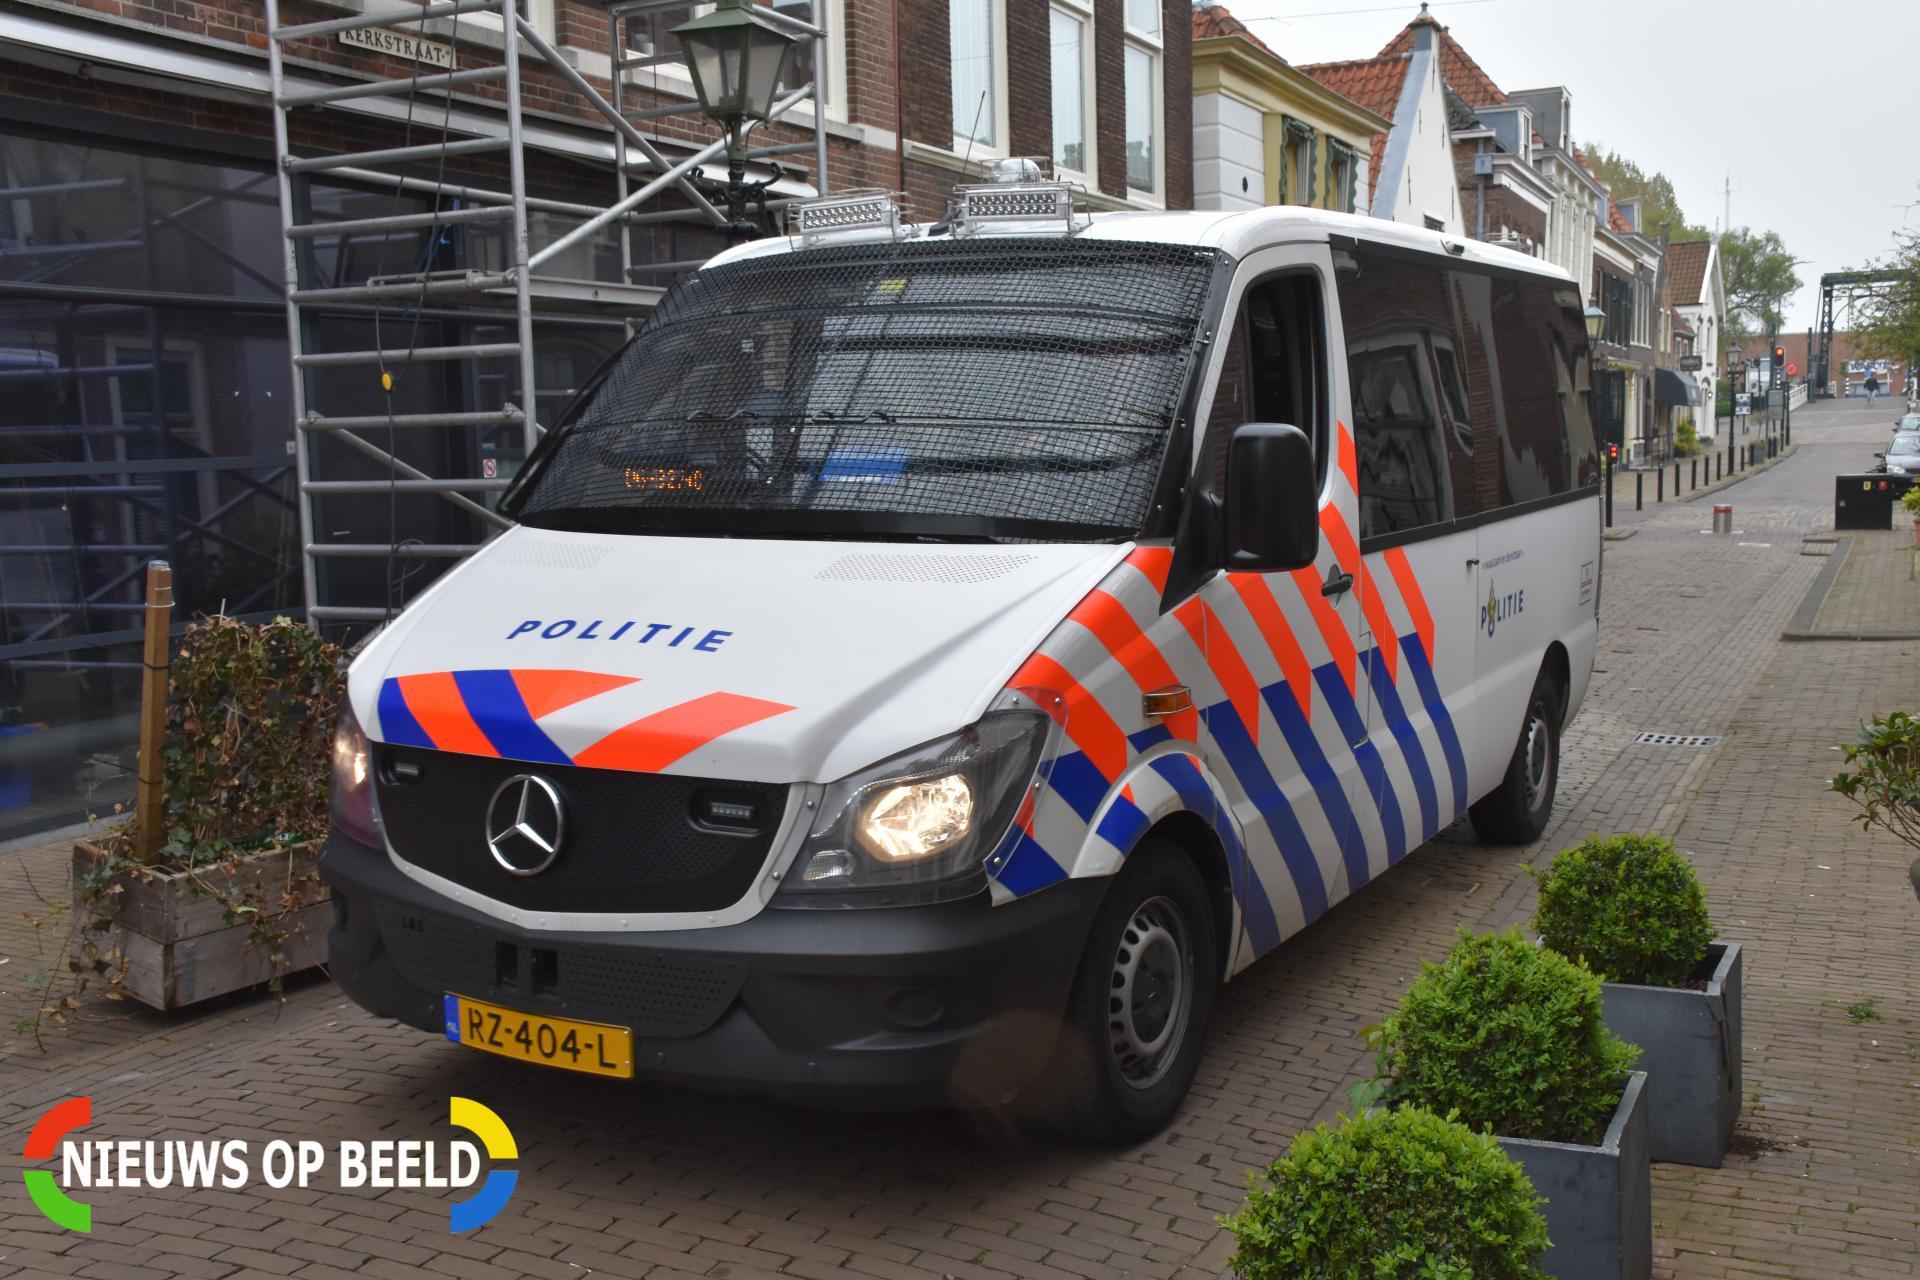 35-jarige dronkaard trapt politieagent en sloopt politiebus Maasvlakteweg Rotterdam